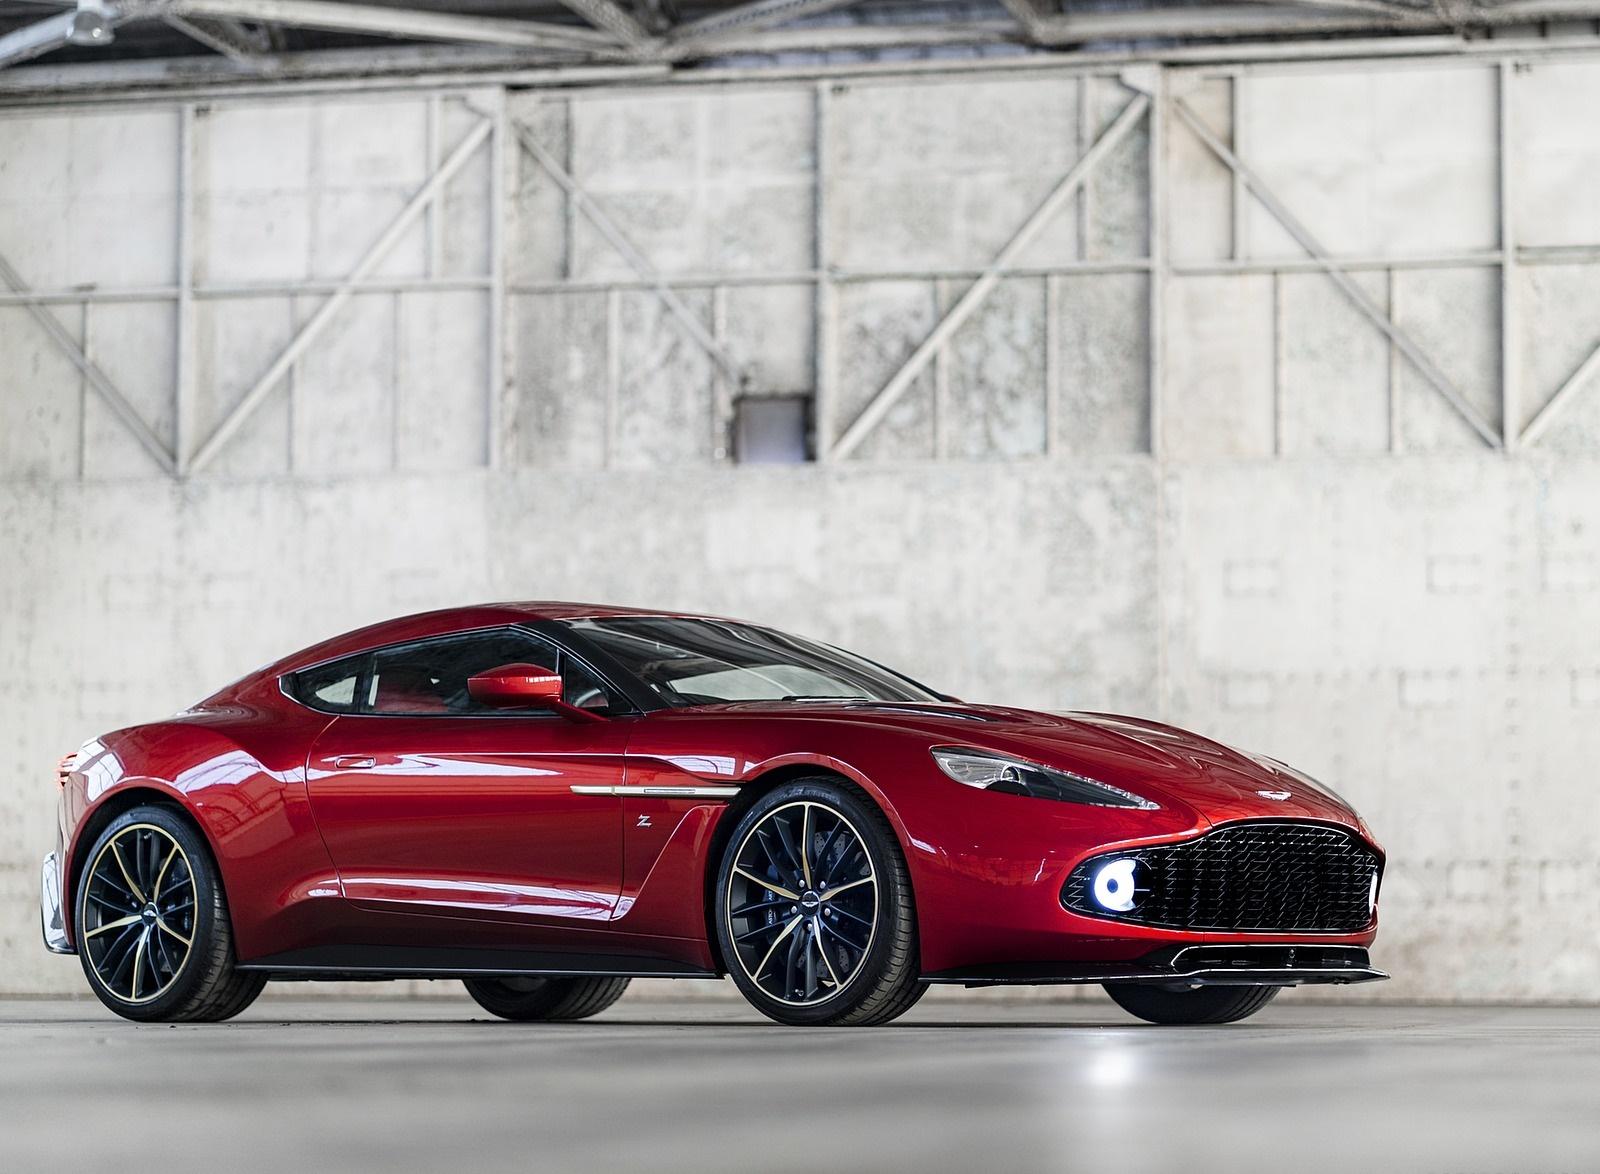 2018 Aston Martin Vanquish Zagato Coupe Front Three-Quarter Wallpapers (1)